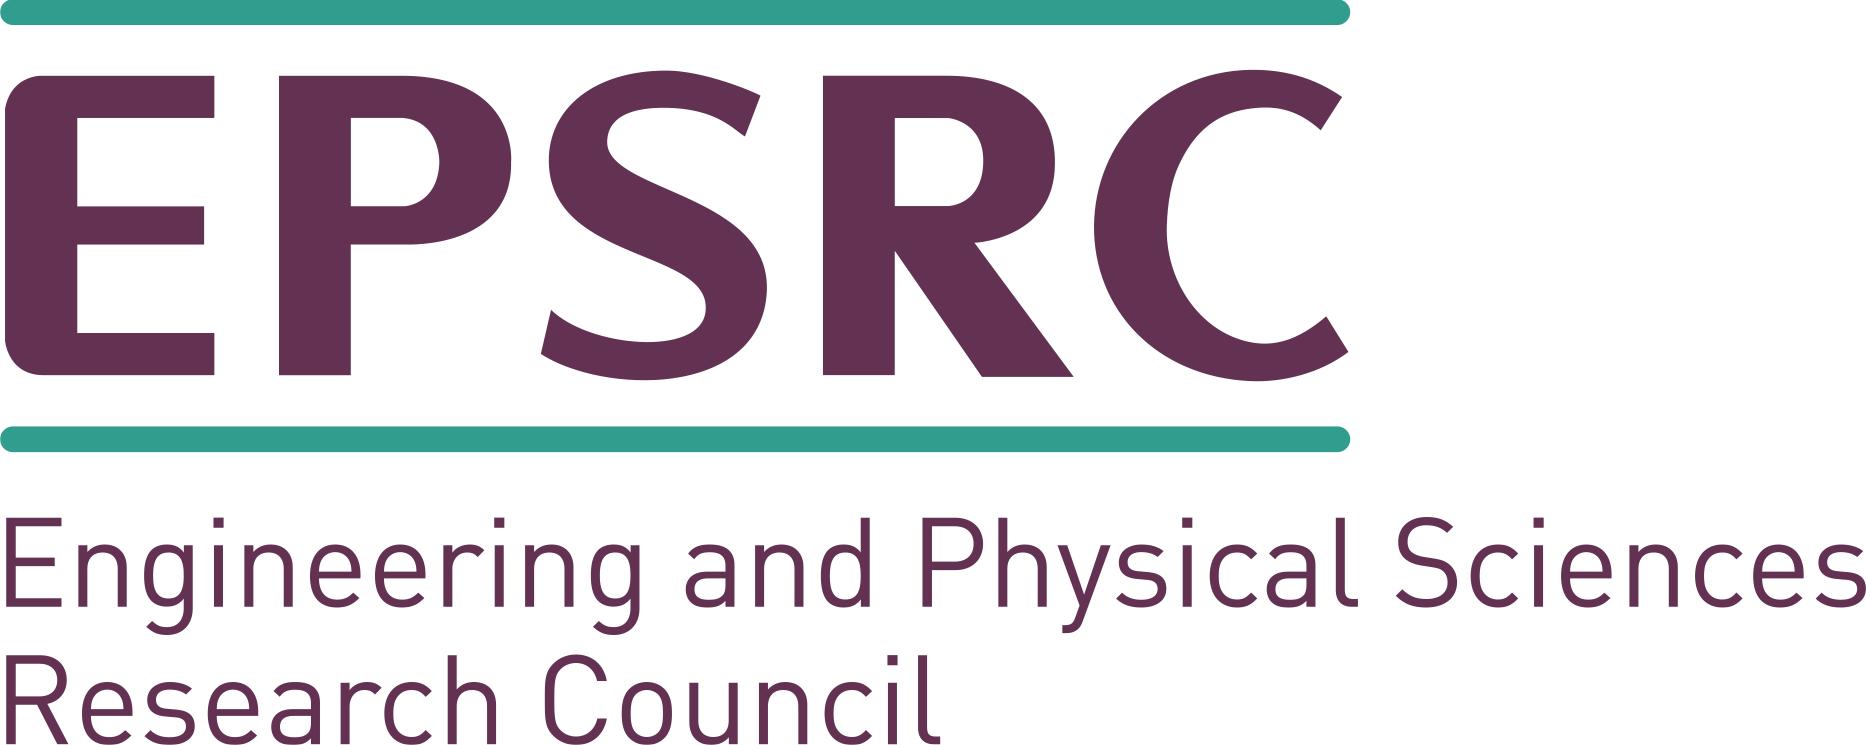 epsrc-logo.png